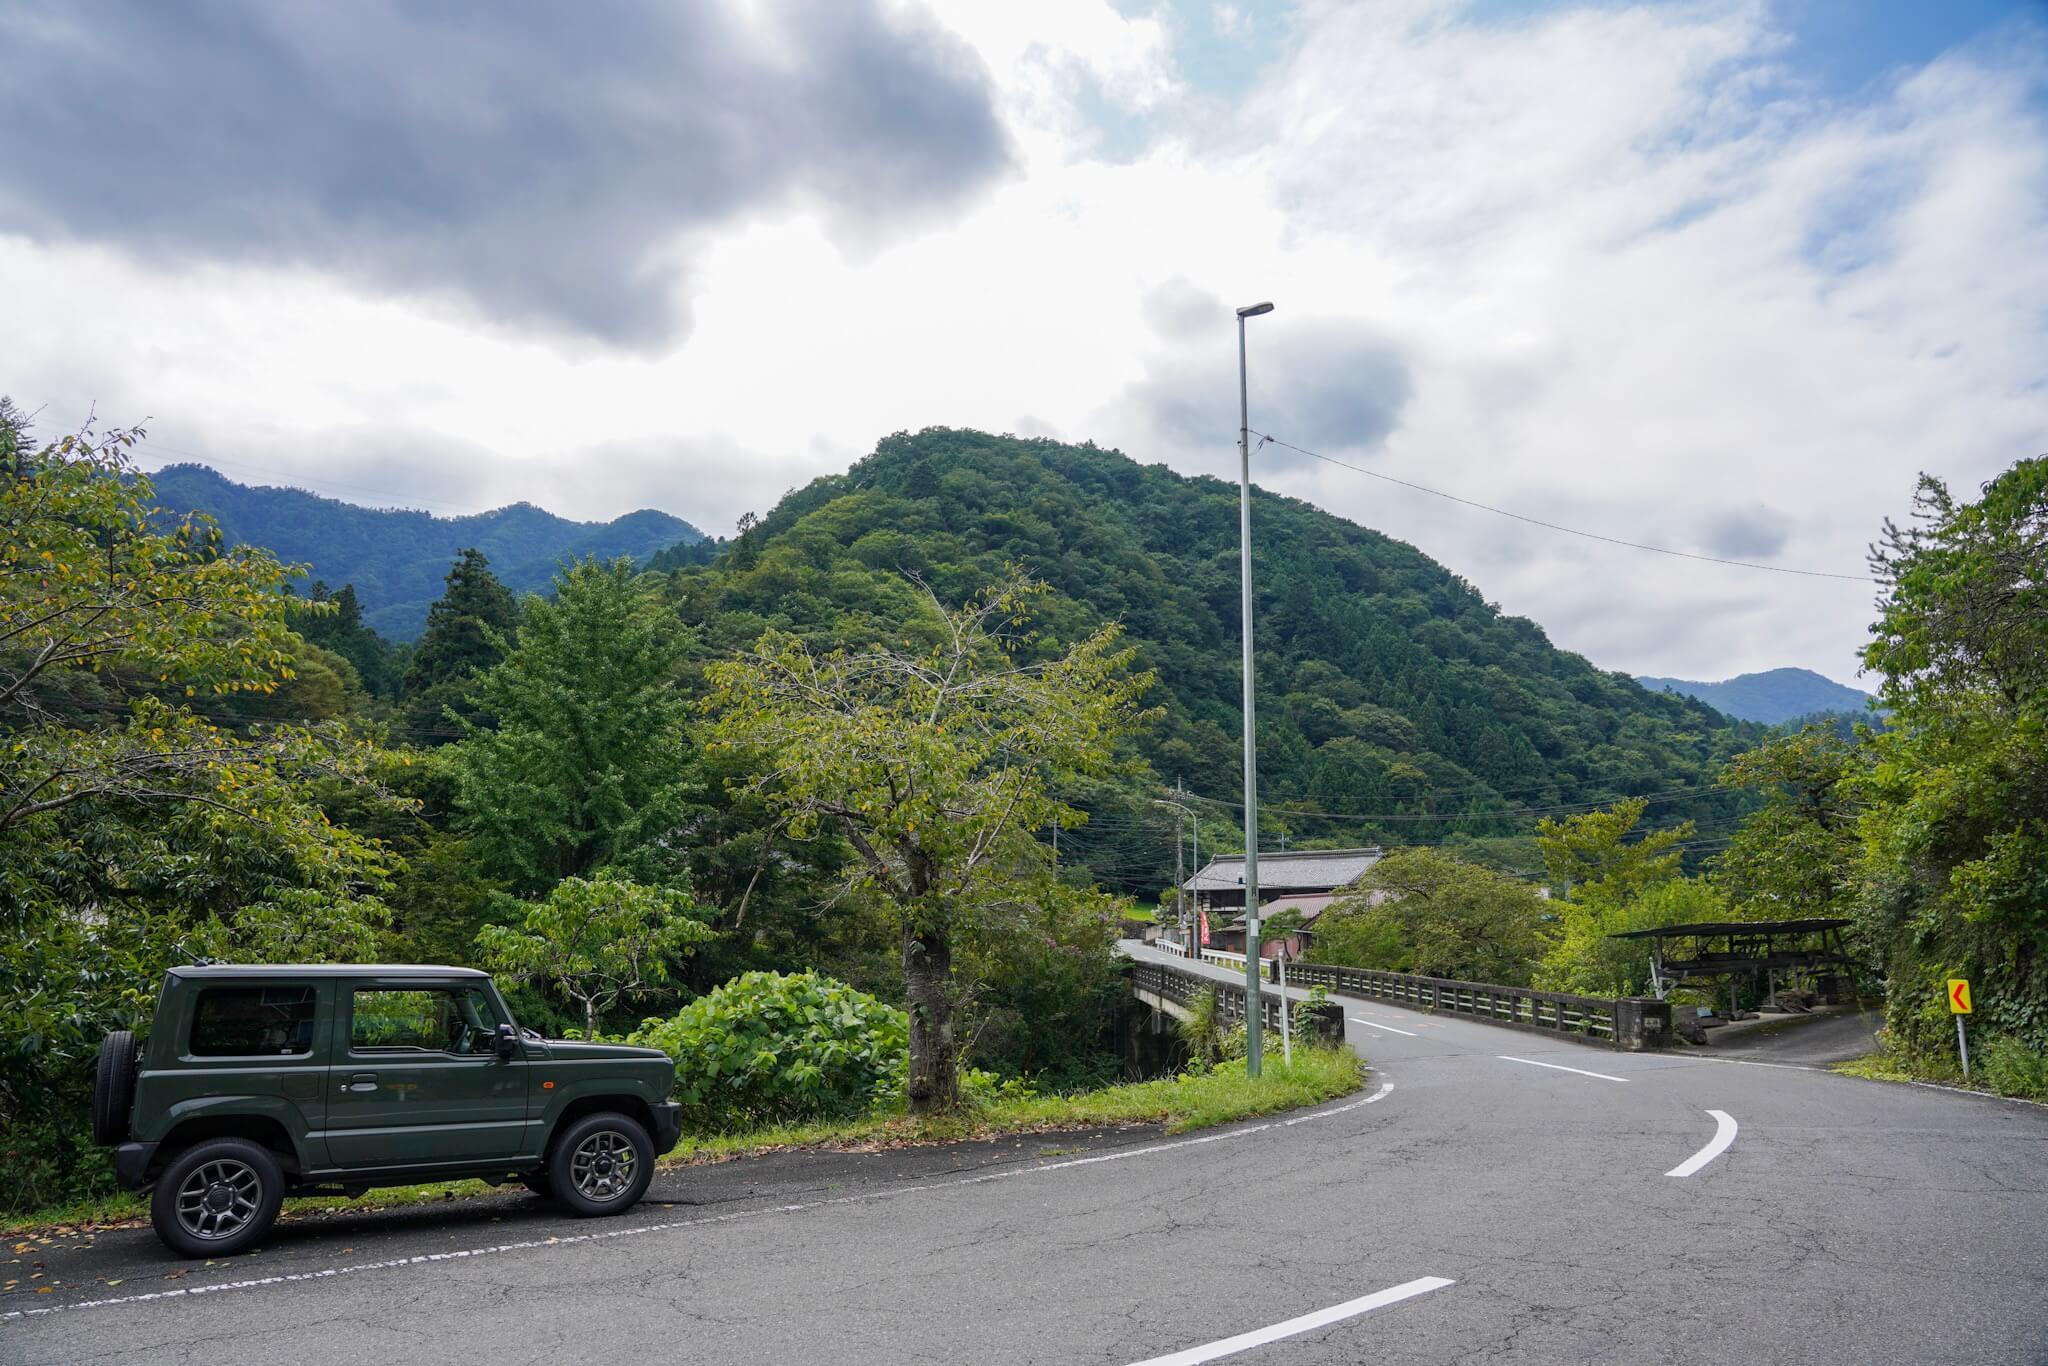 国道299号 埼玉県小鹿野町 河原沢川を渡る橋